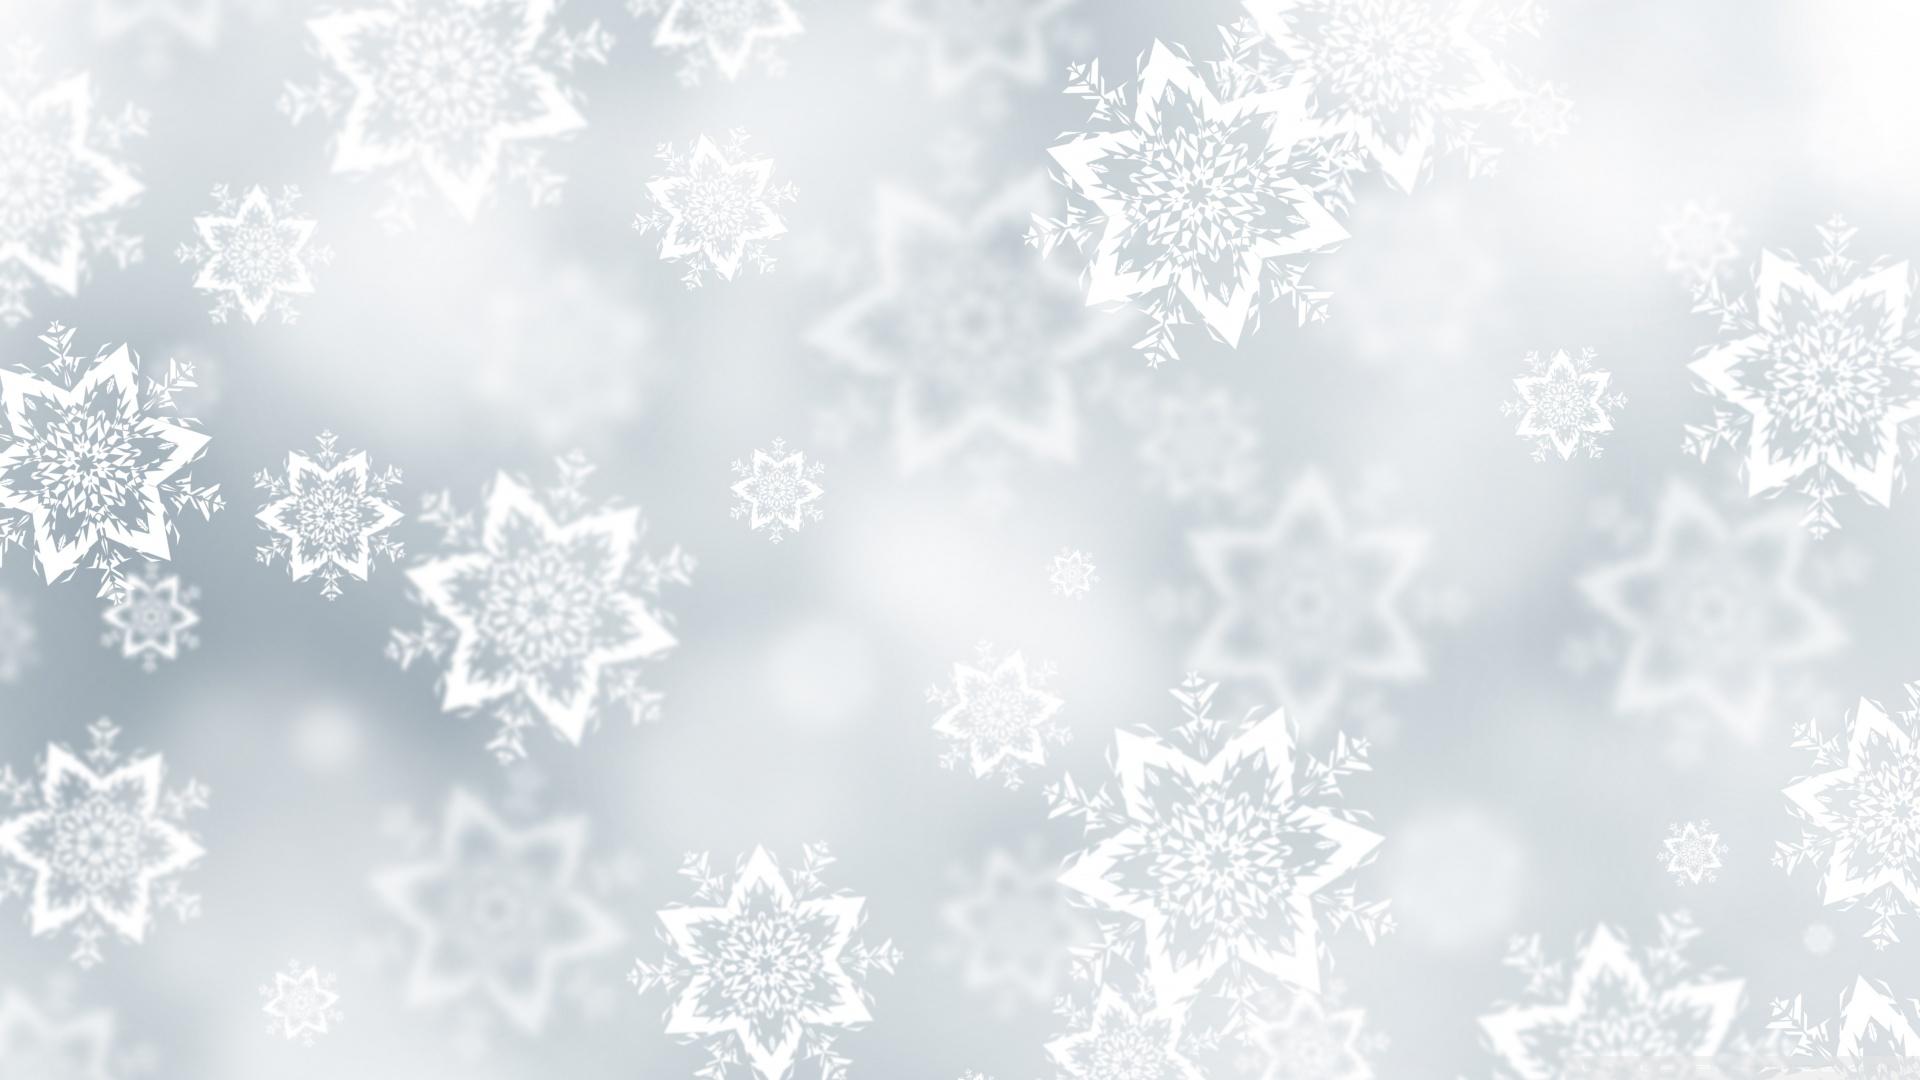 17 wonderful hd snowflakes wallpapers hdwallsource 17 wonderful hd snowflakes wallpapers voltagebd Choice Image